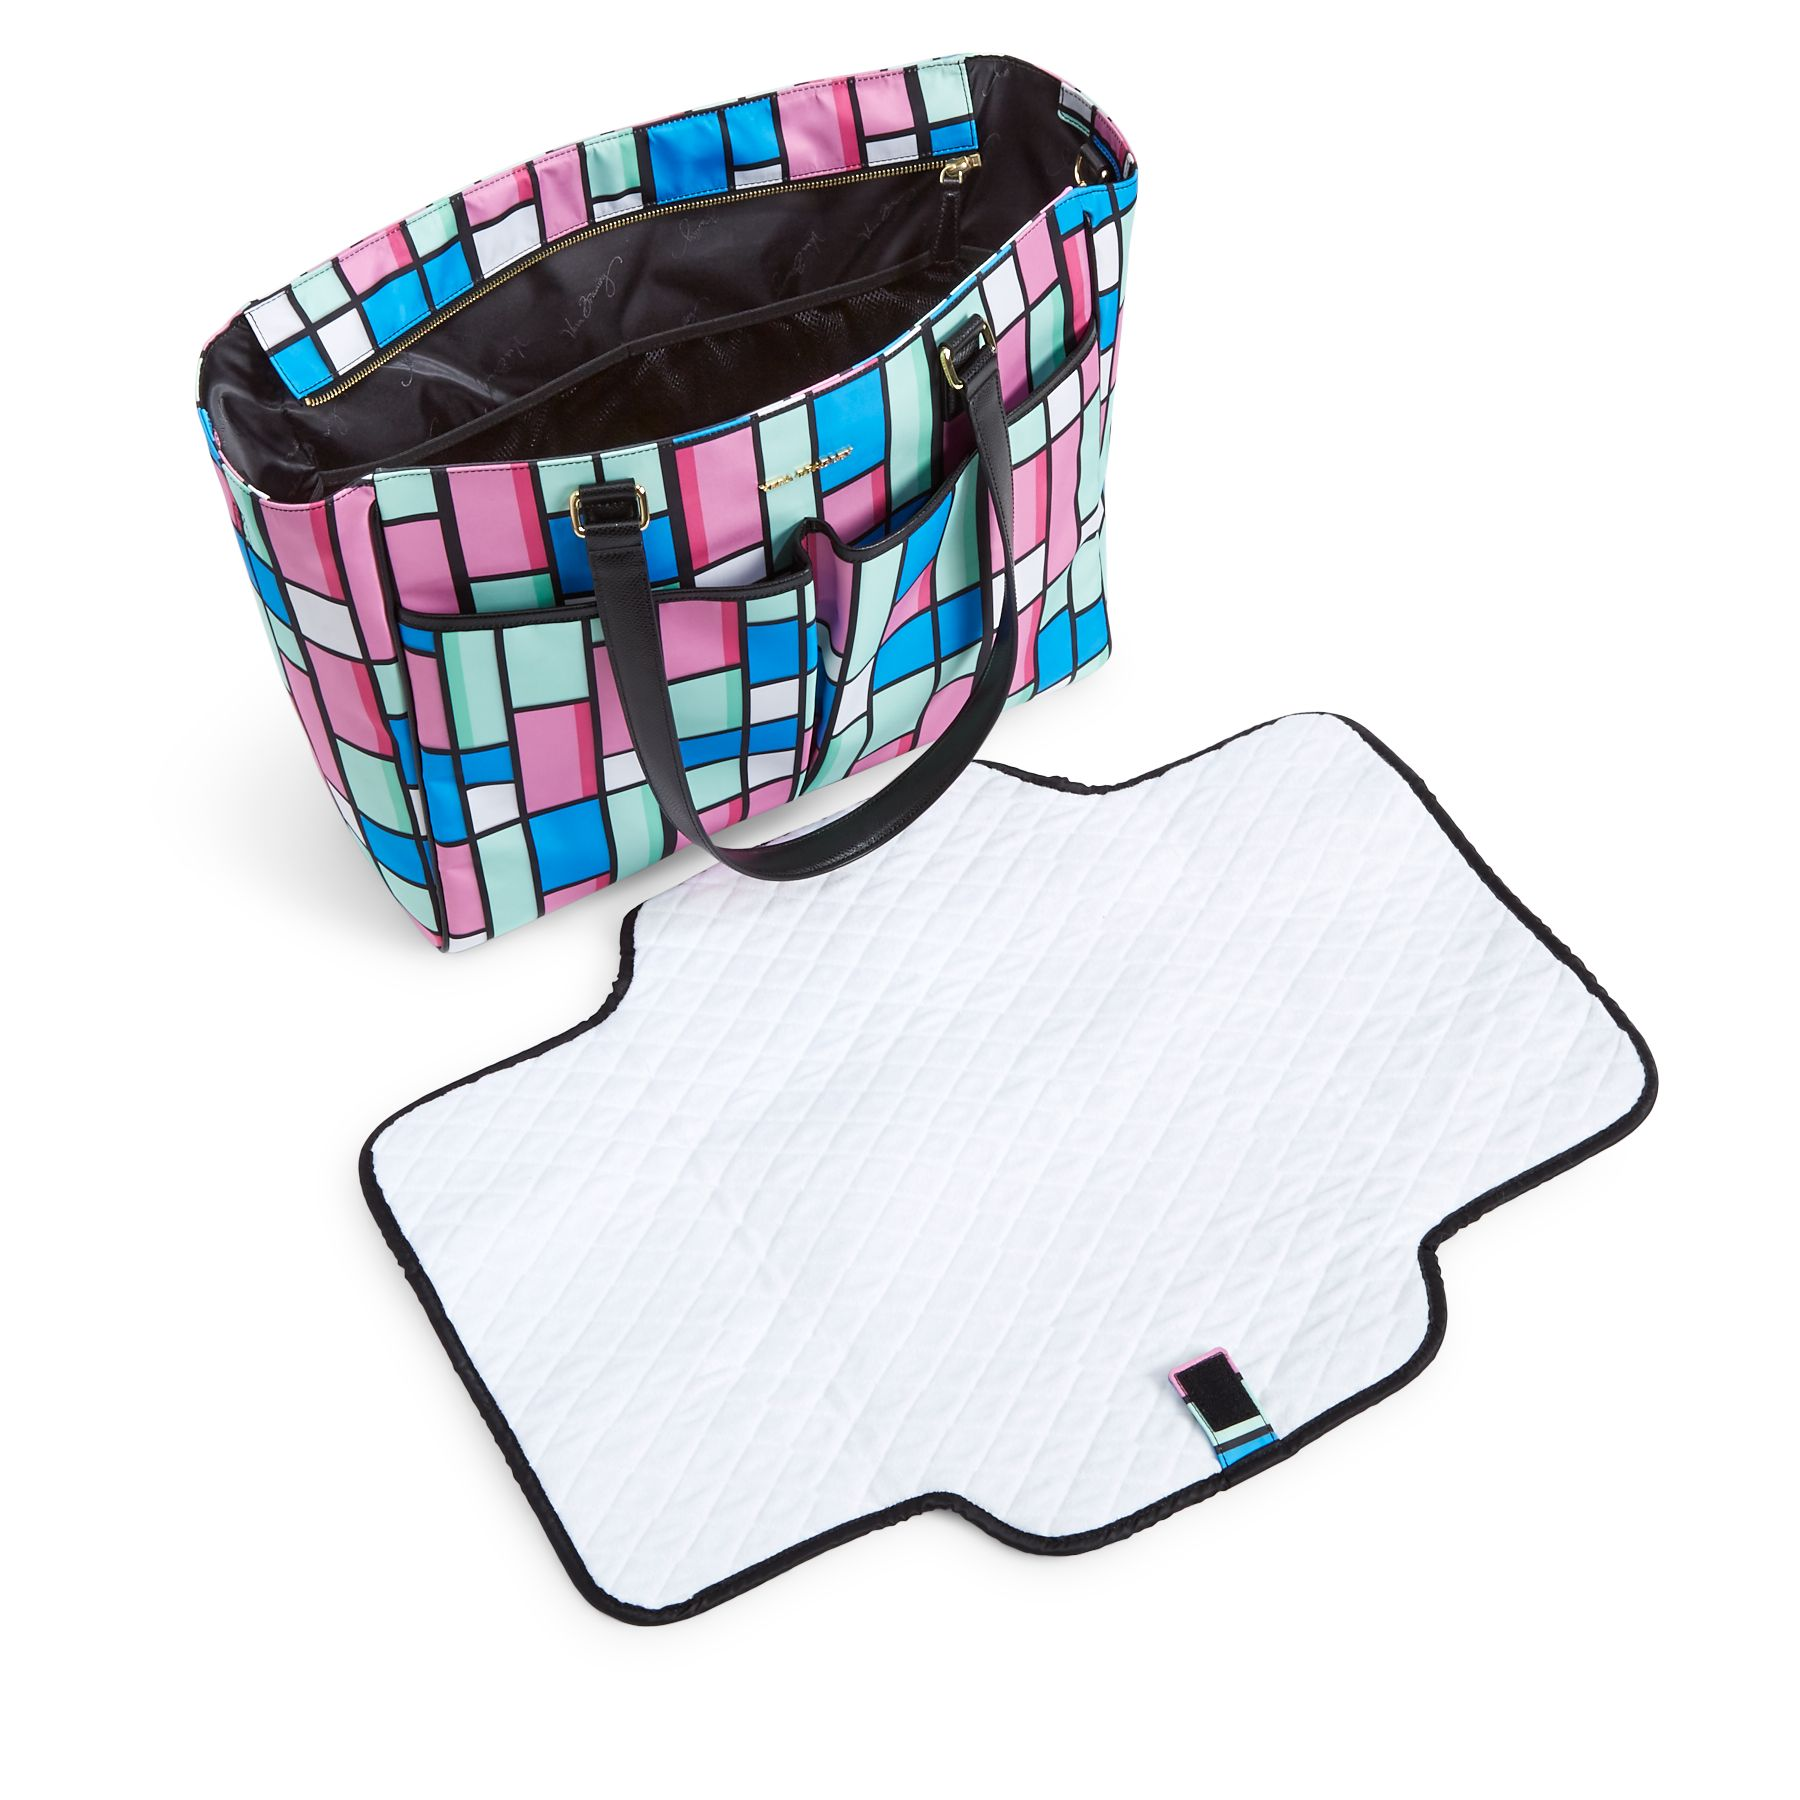 vera bradley uptown baby diaper bag ebay. Black Bedroom Furniture Sets. Home Design Ideas